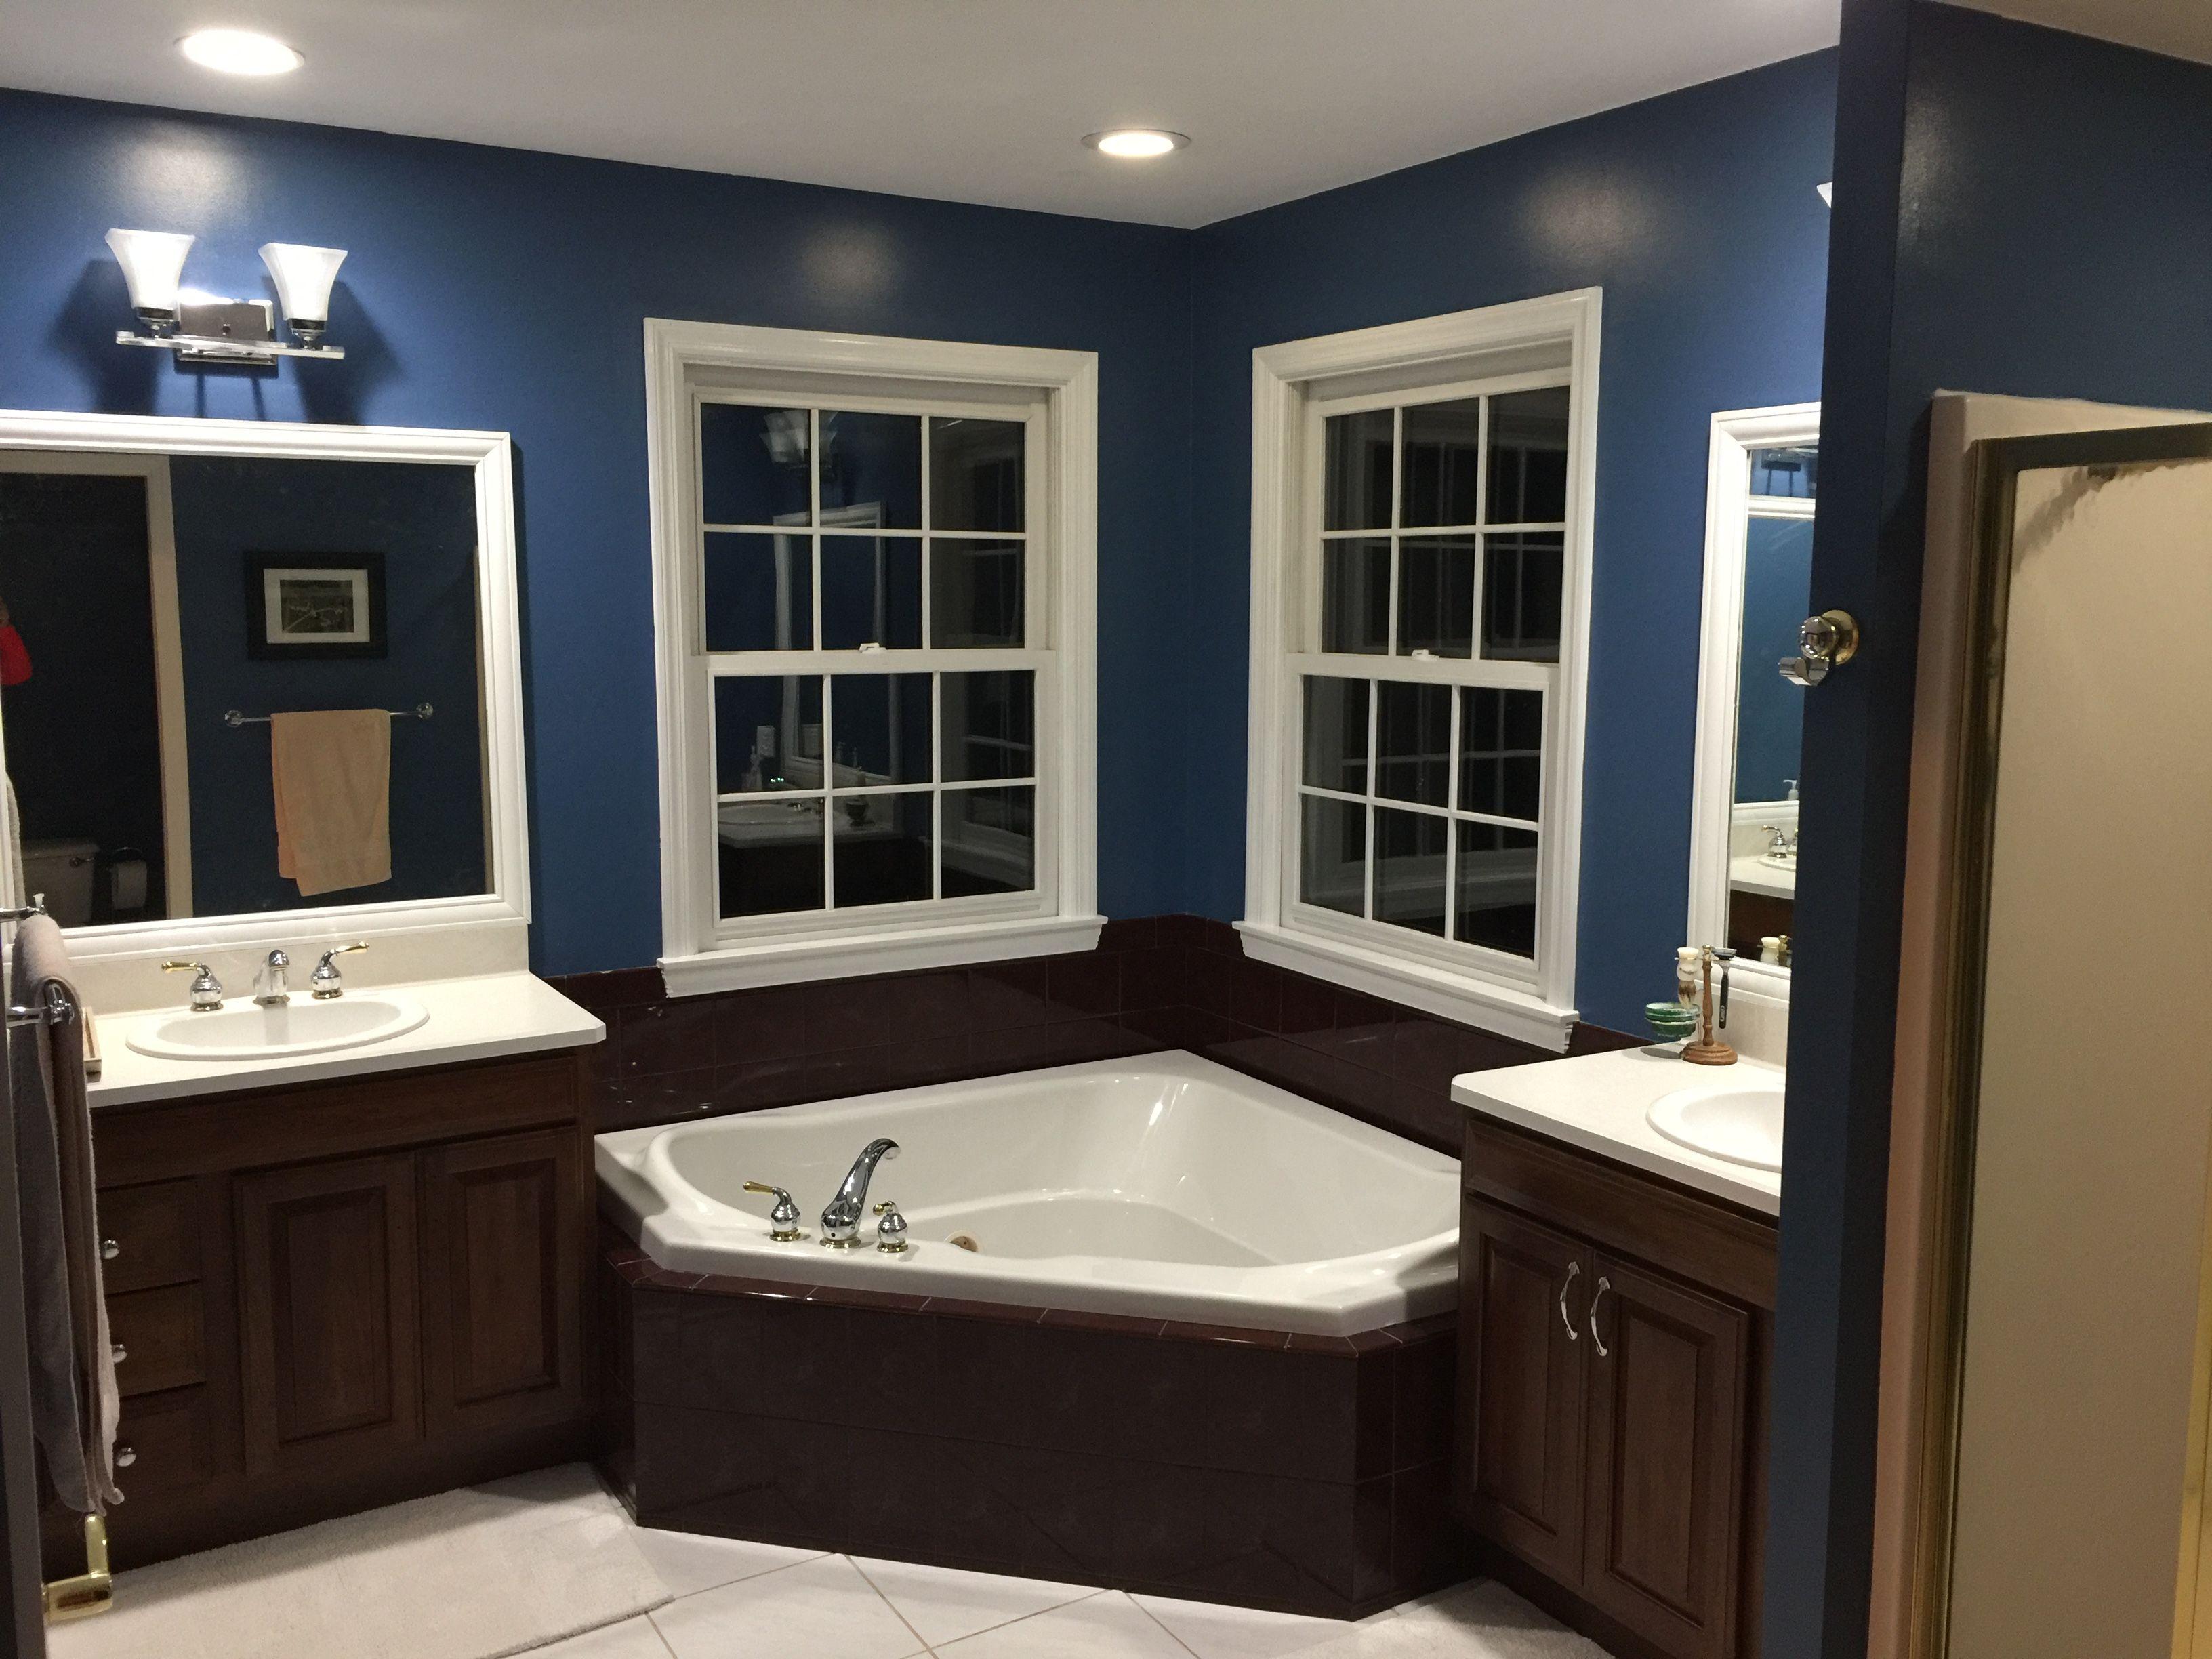 Sherwin Williams Inky Blue Yes Master Corner Bathtub